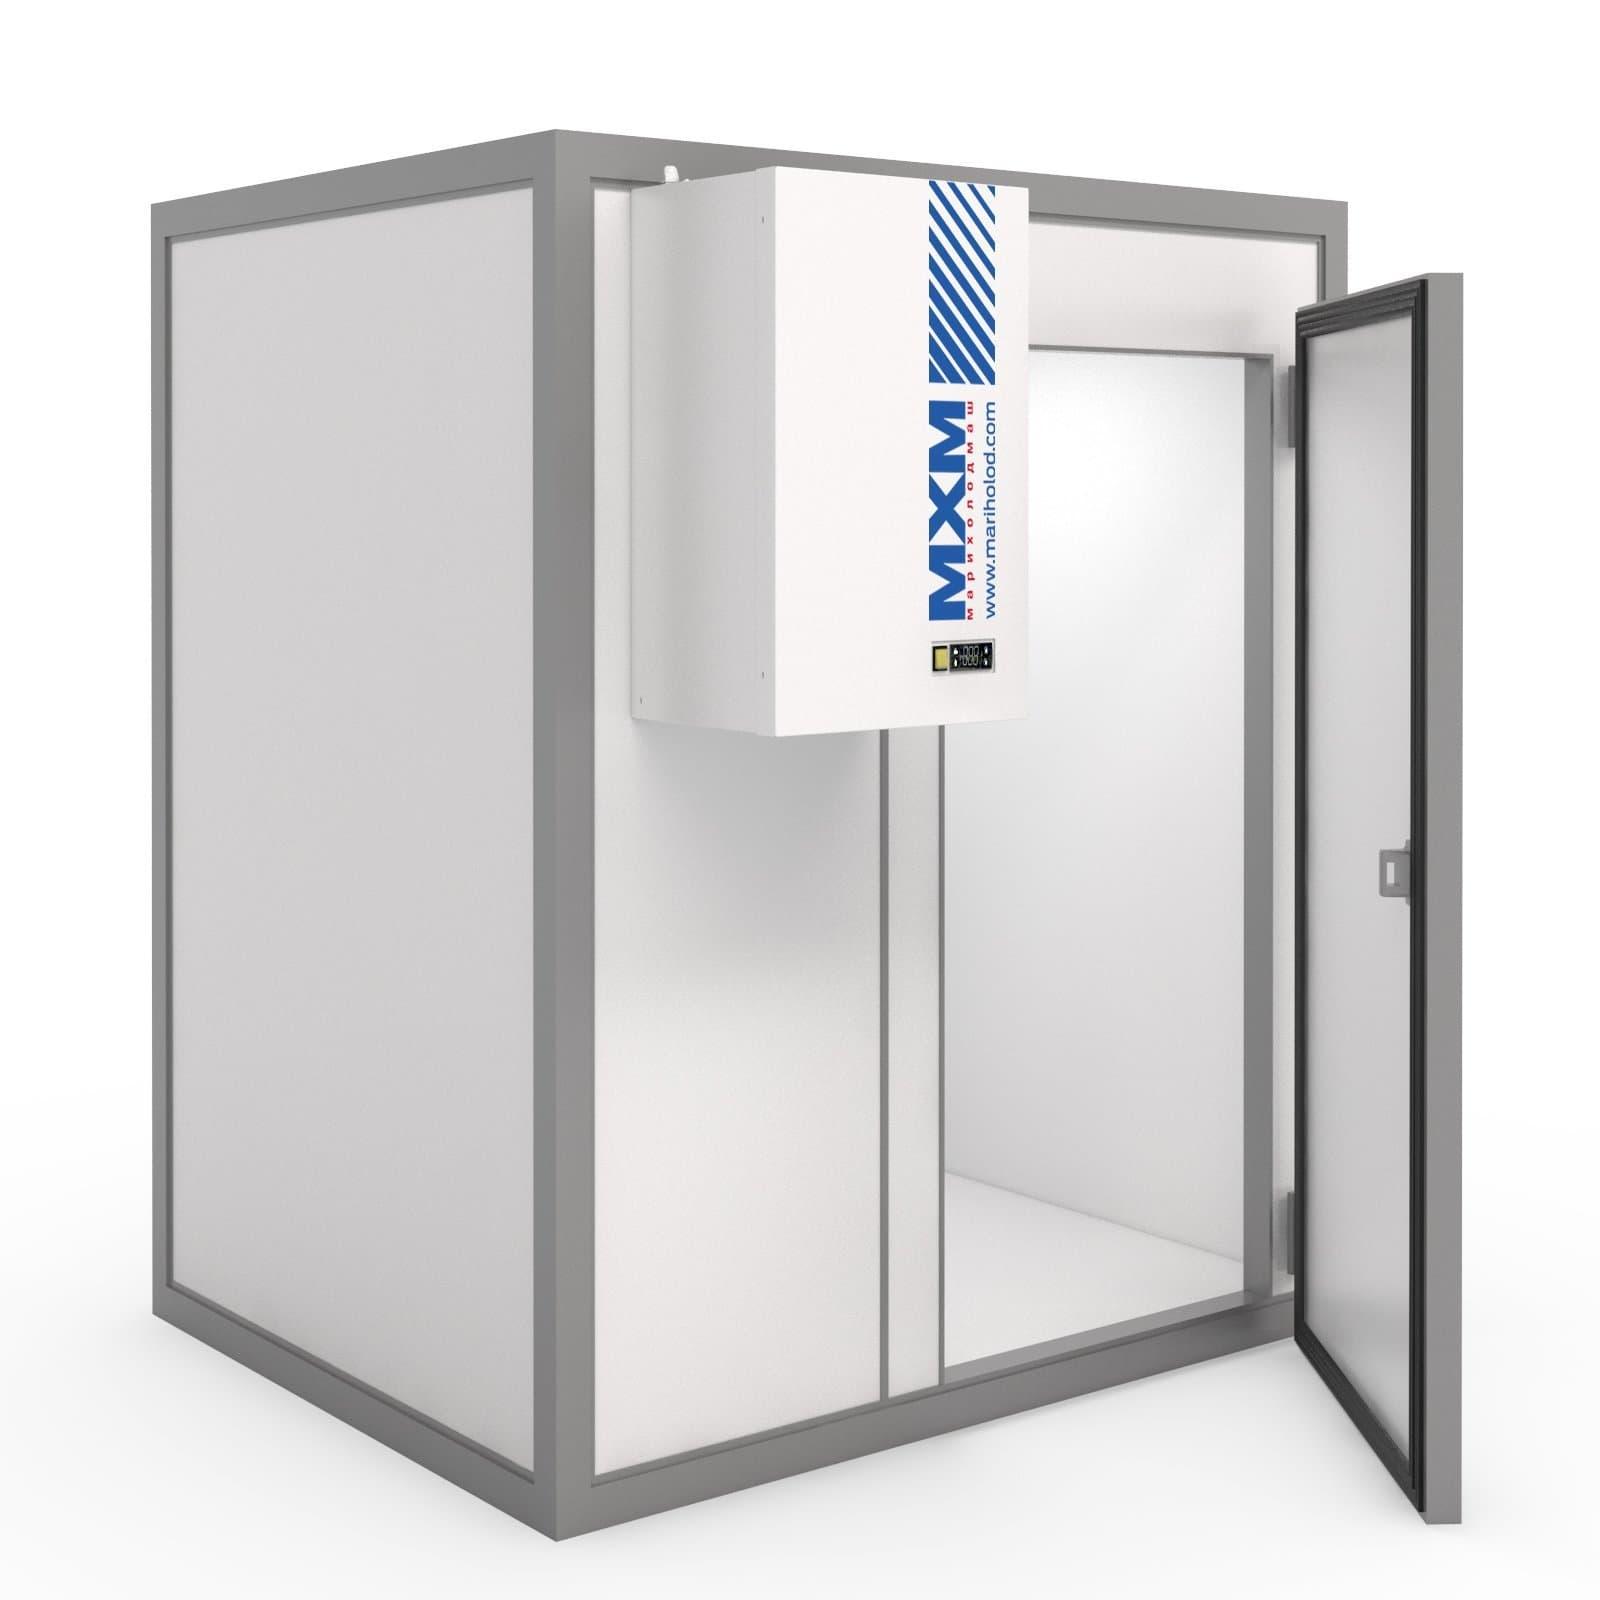 Камера холодильная МХМ КХН-24,84 1660×7360×2460